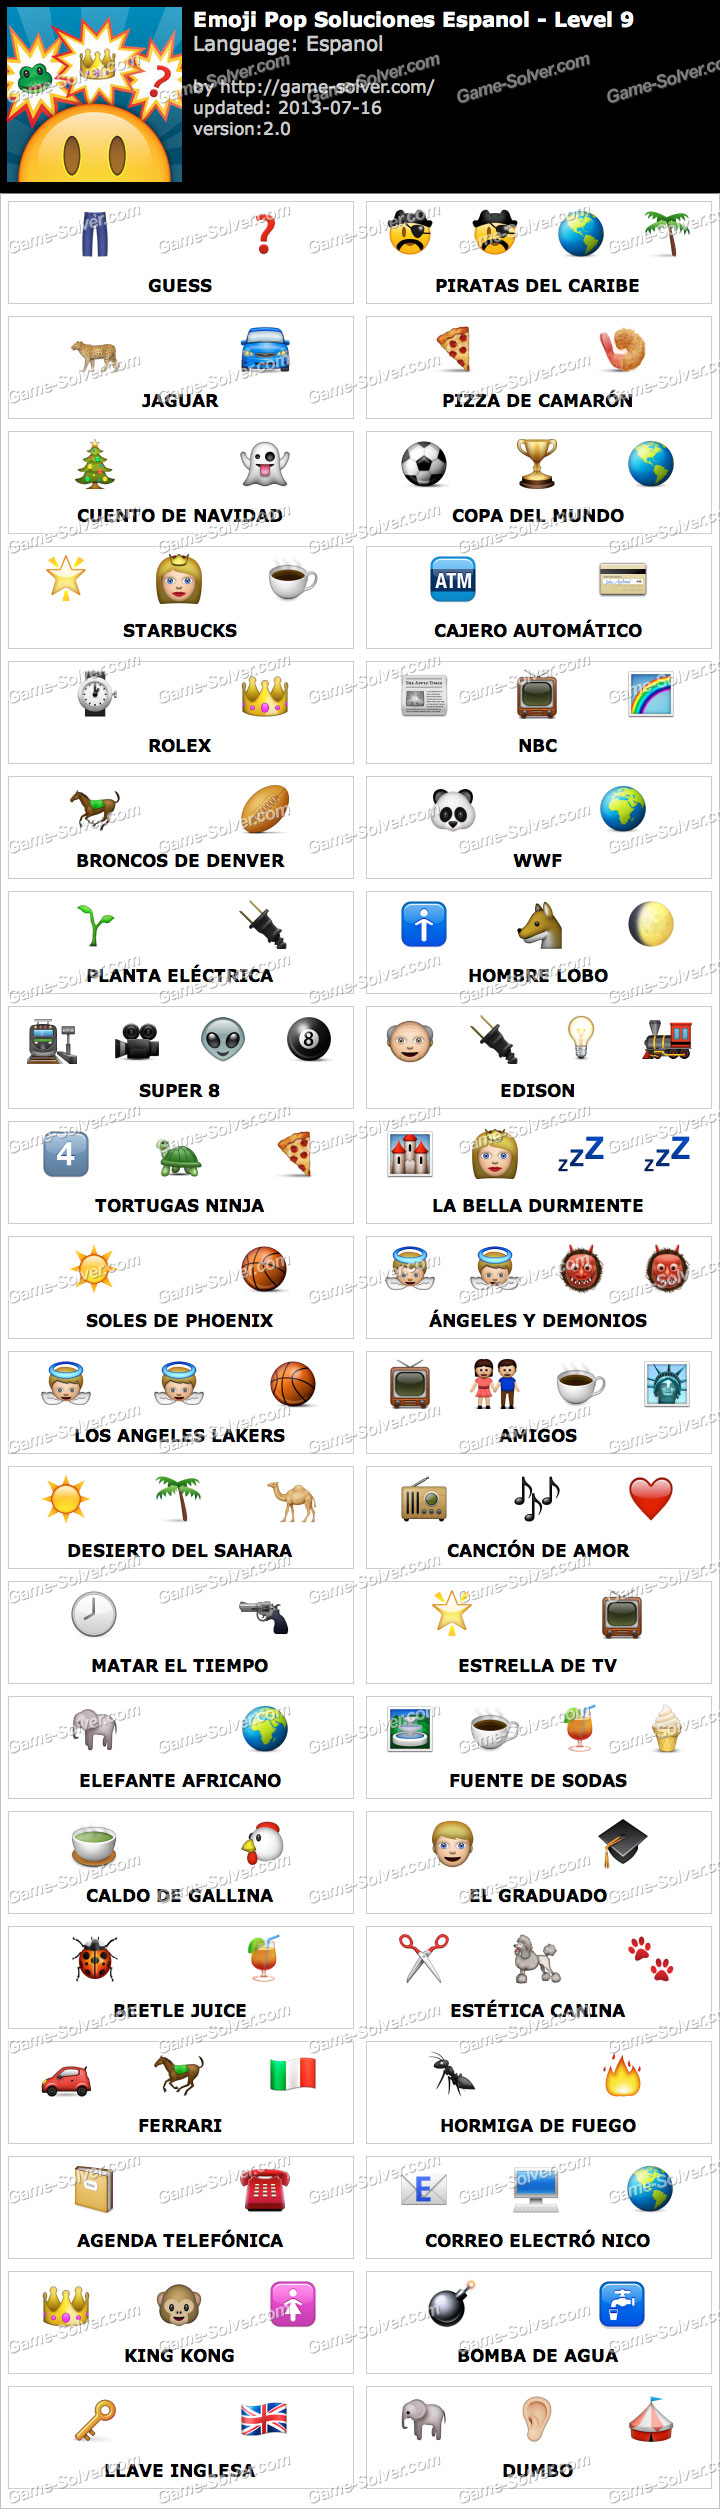 Emoji Pop Nivel 9